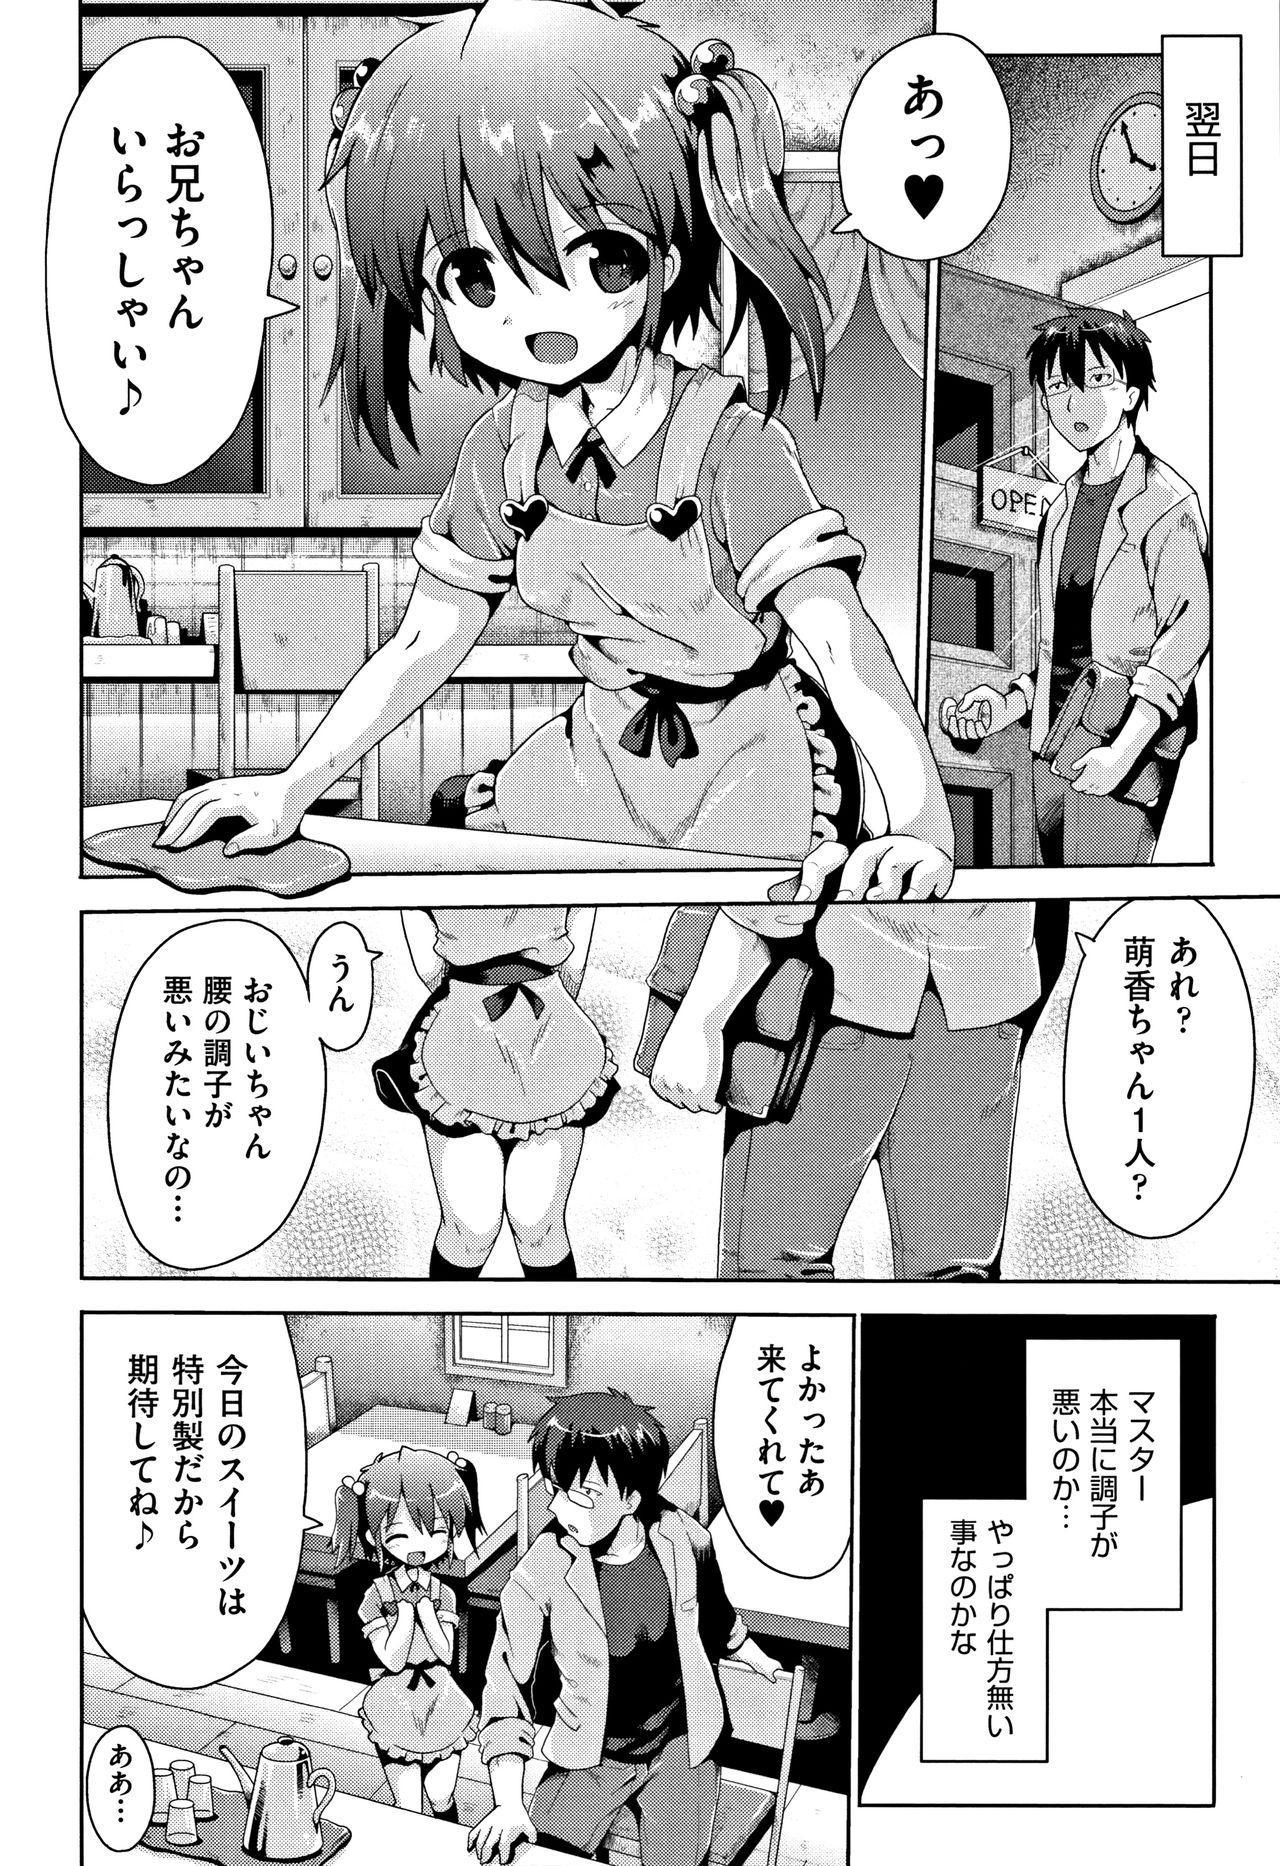 Kokugo Sansuu Rika Sex 174